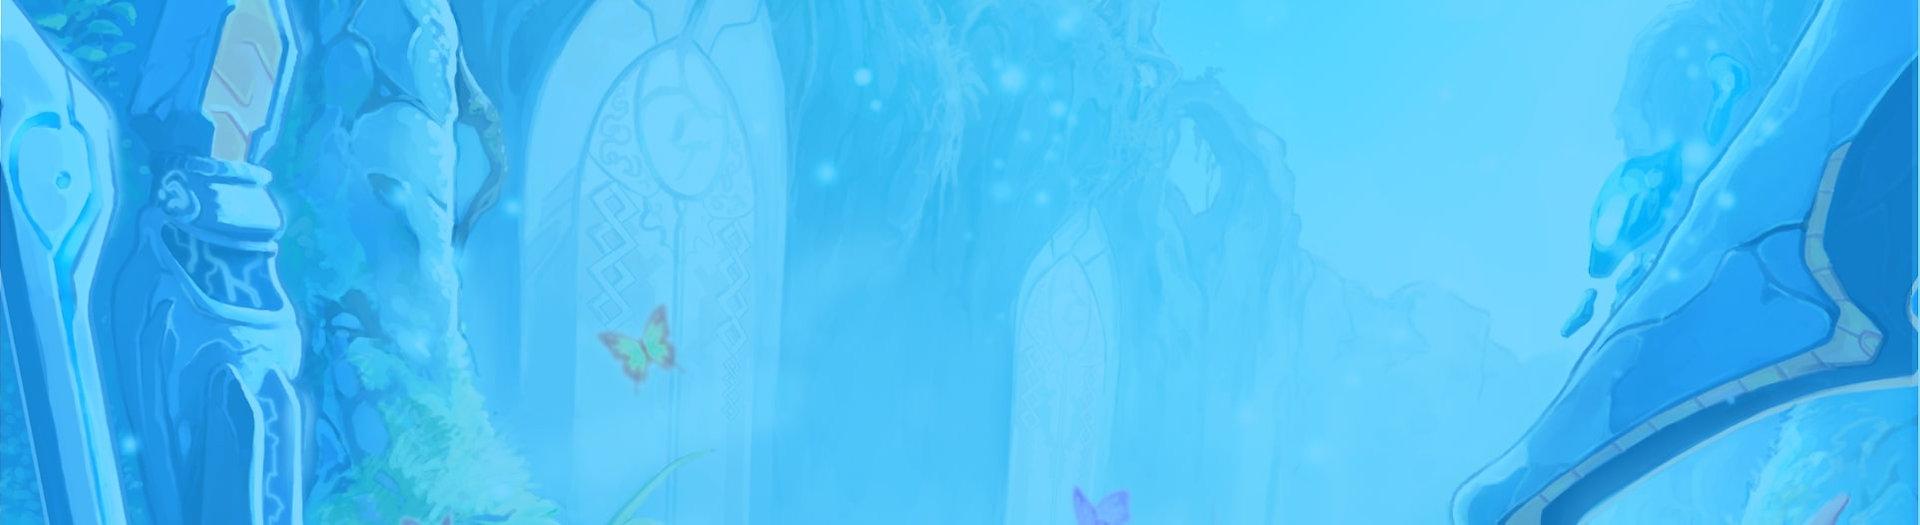 Fond magique bleu onirique